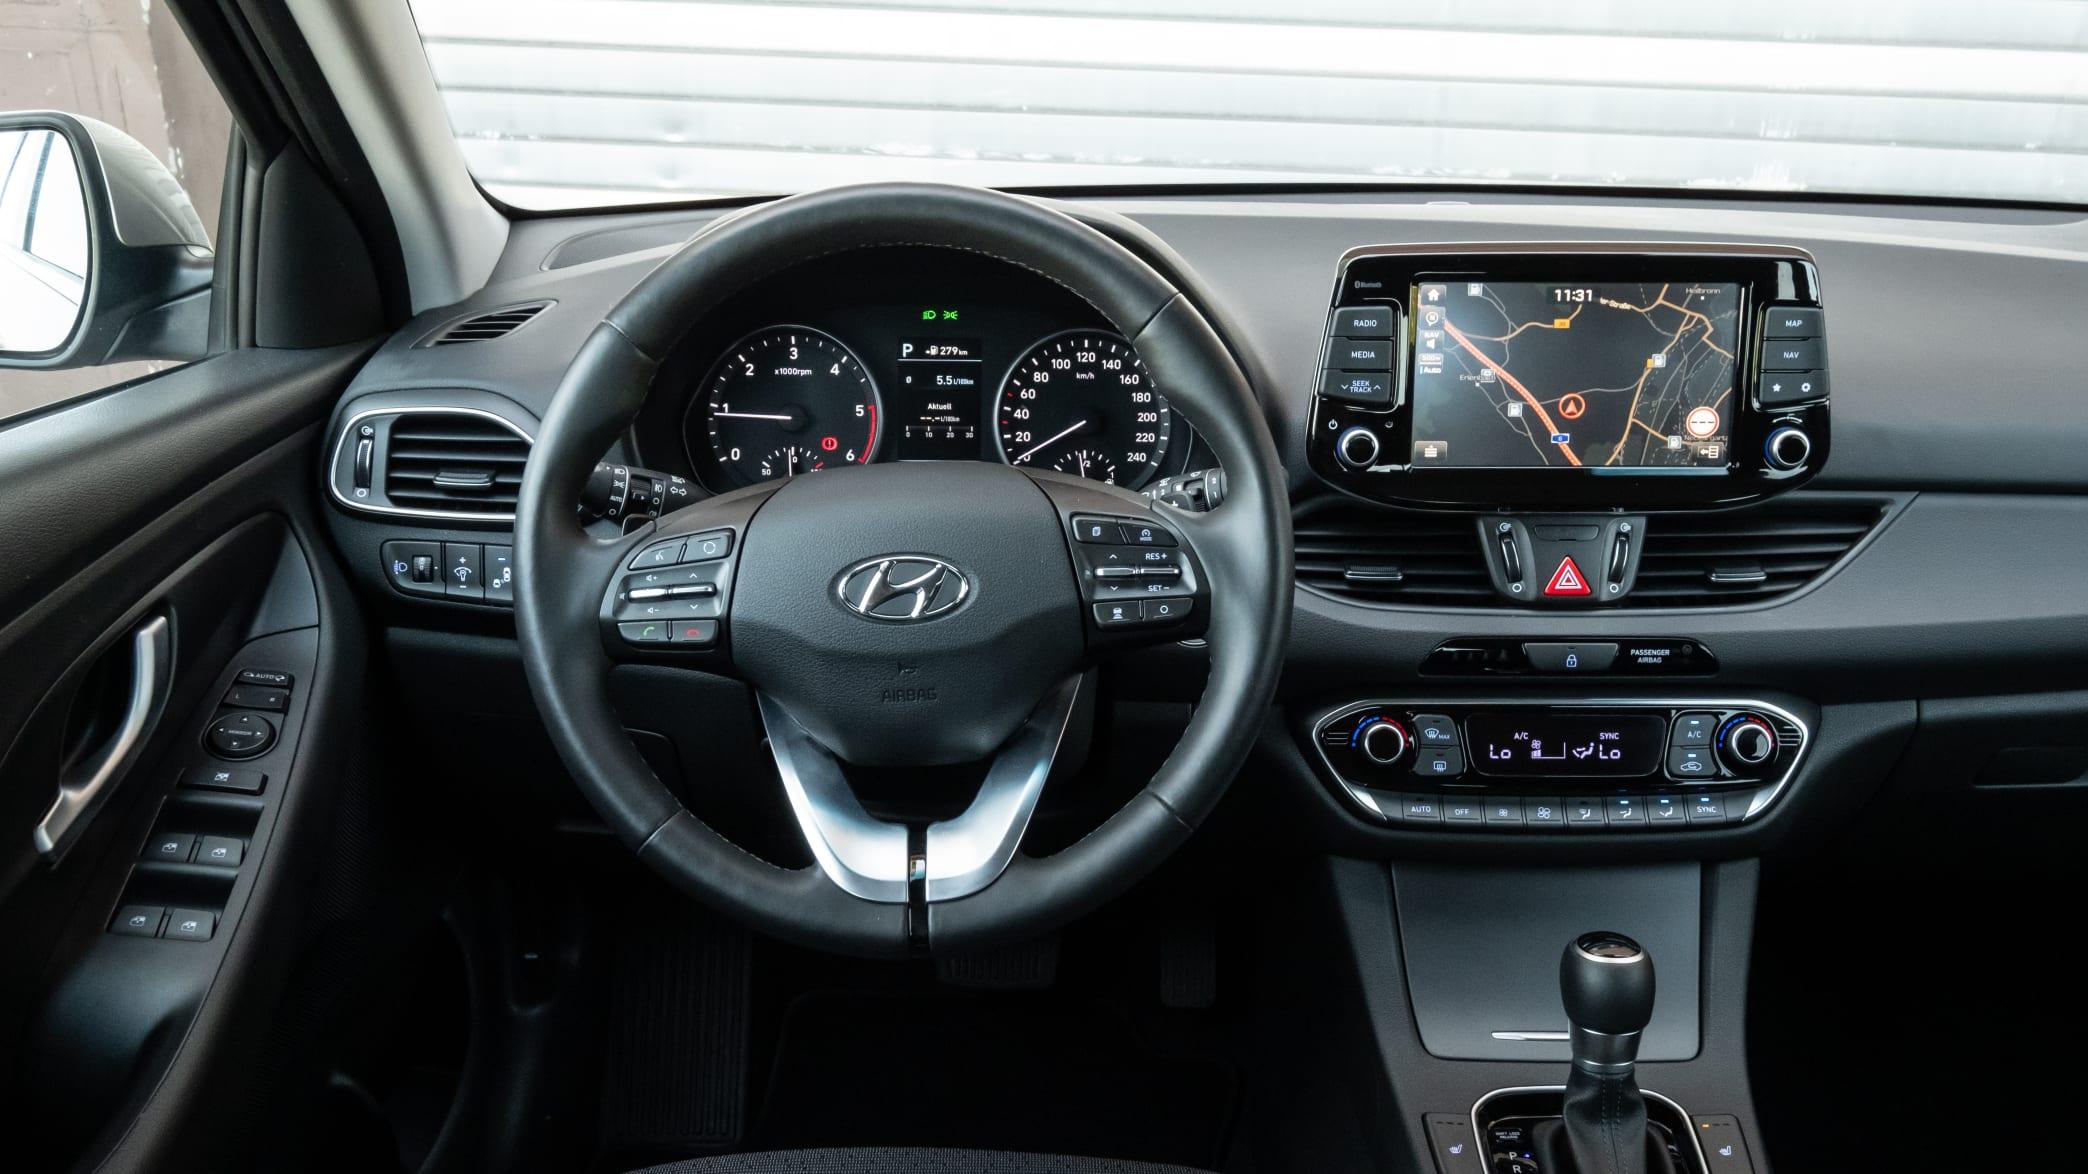 Blick auf das Cockpit des Hyundai i30